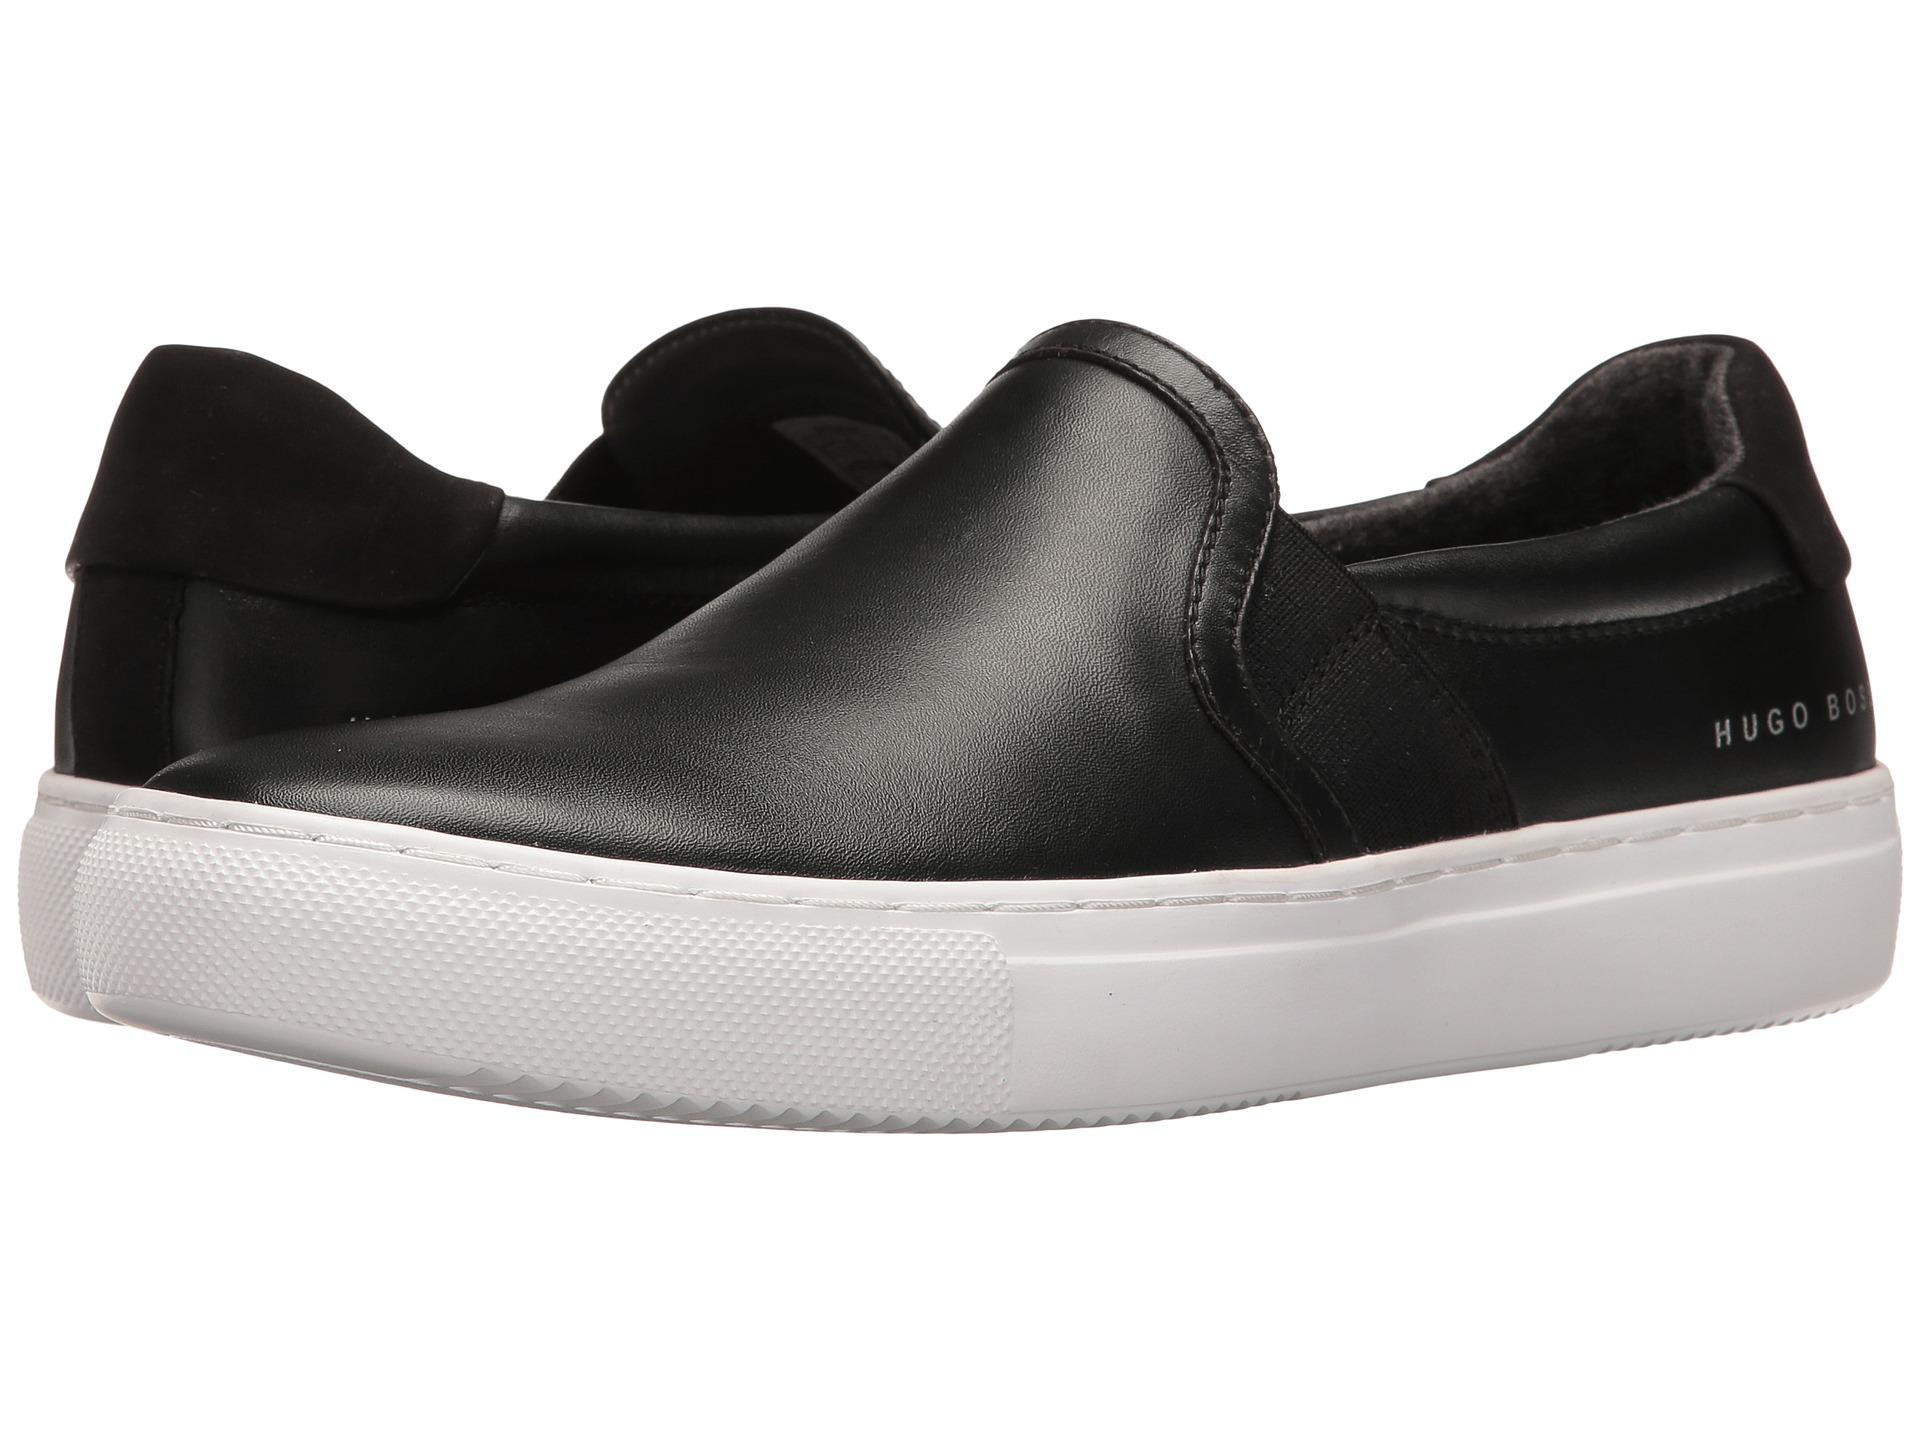 Boss Black Shoes Review